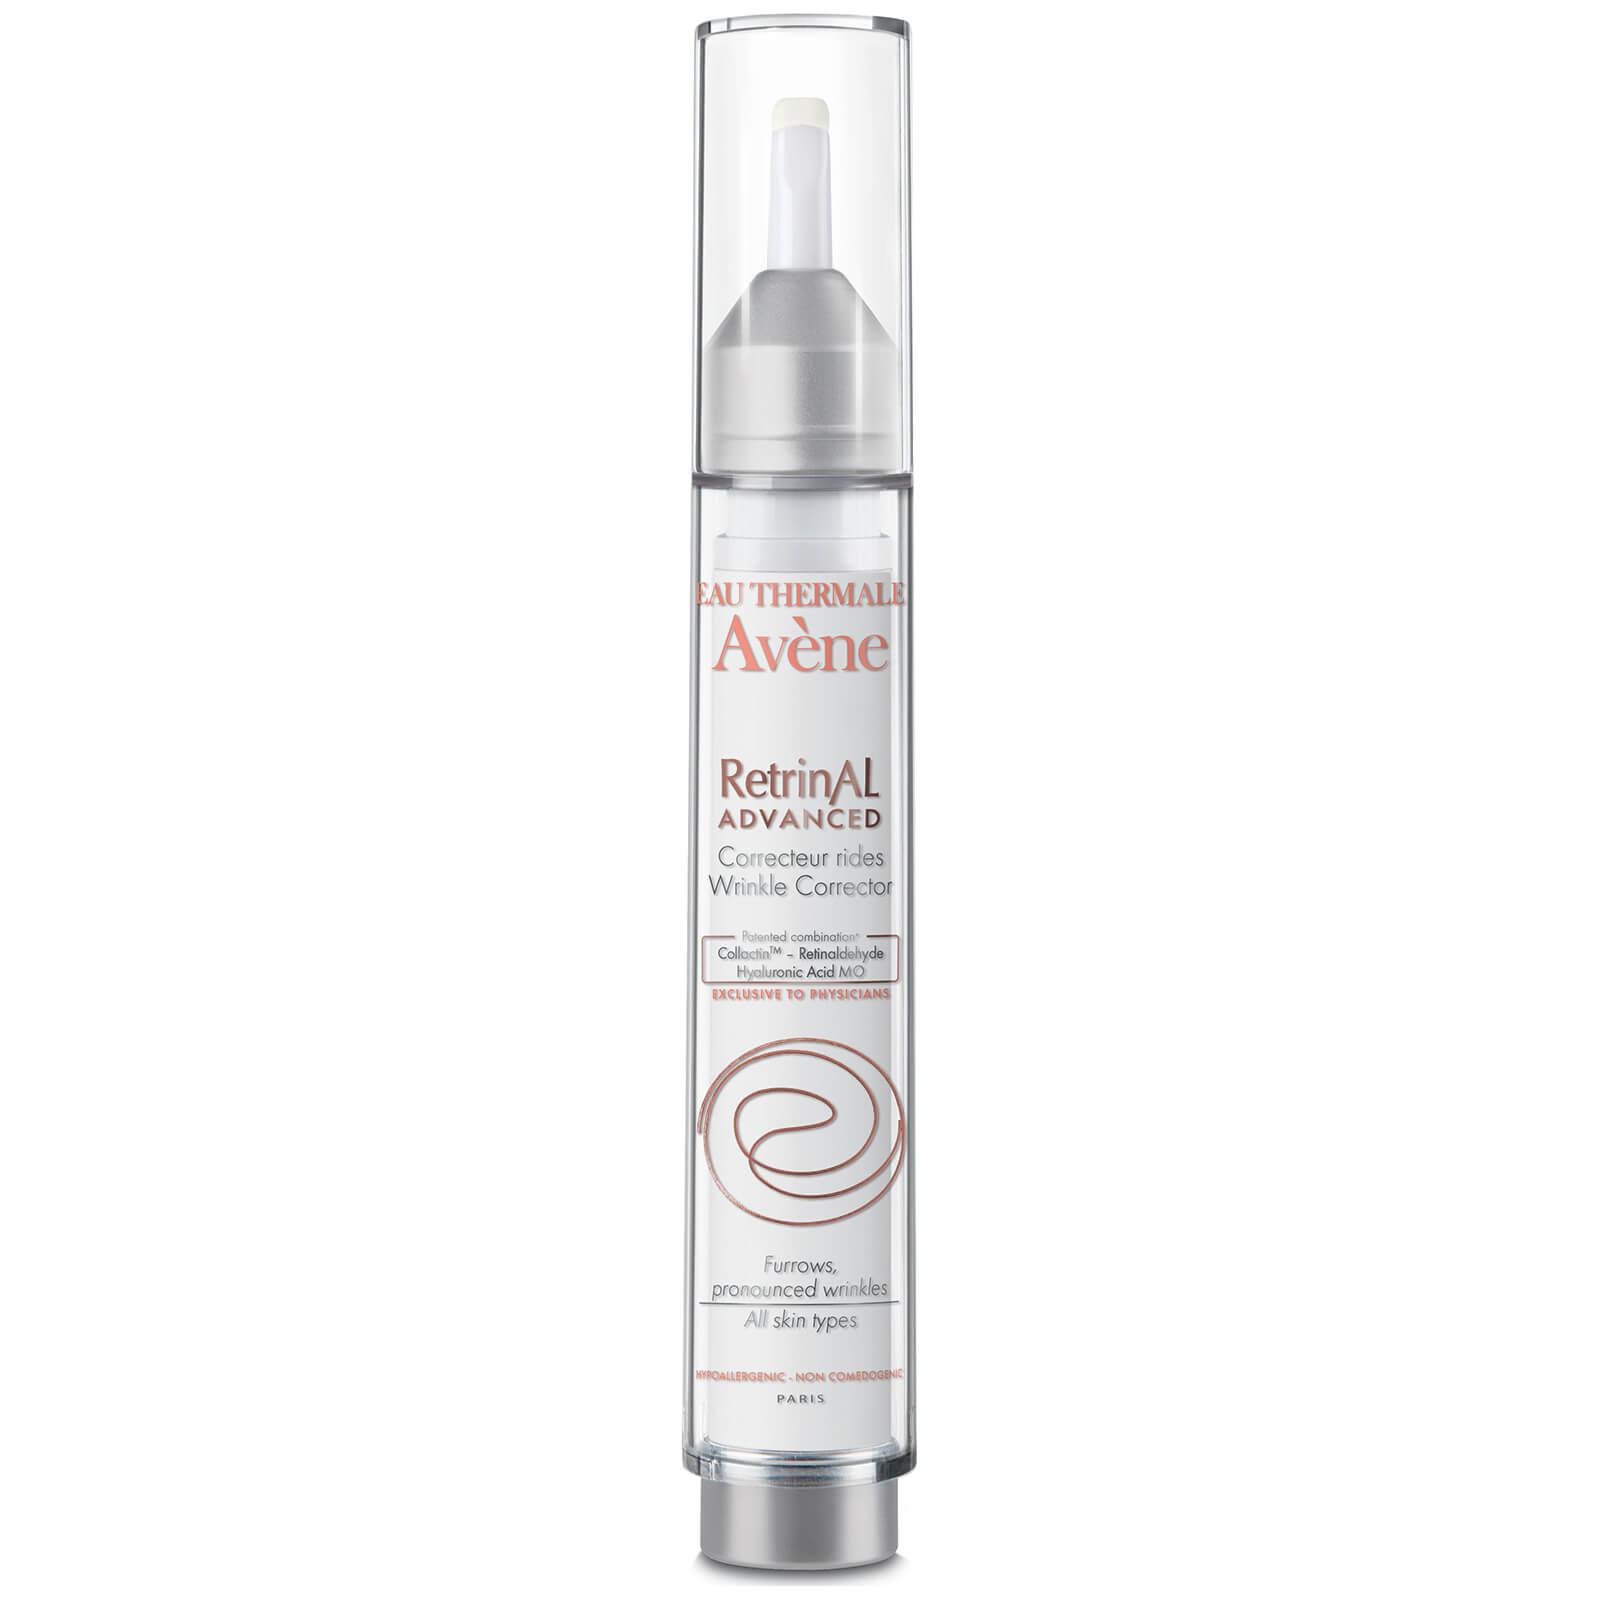 Retinaldehyde - Avéne Retrinal Advanced Wrinkle Corrector